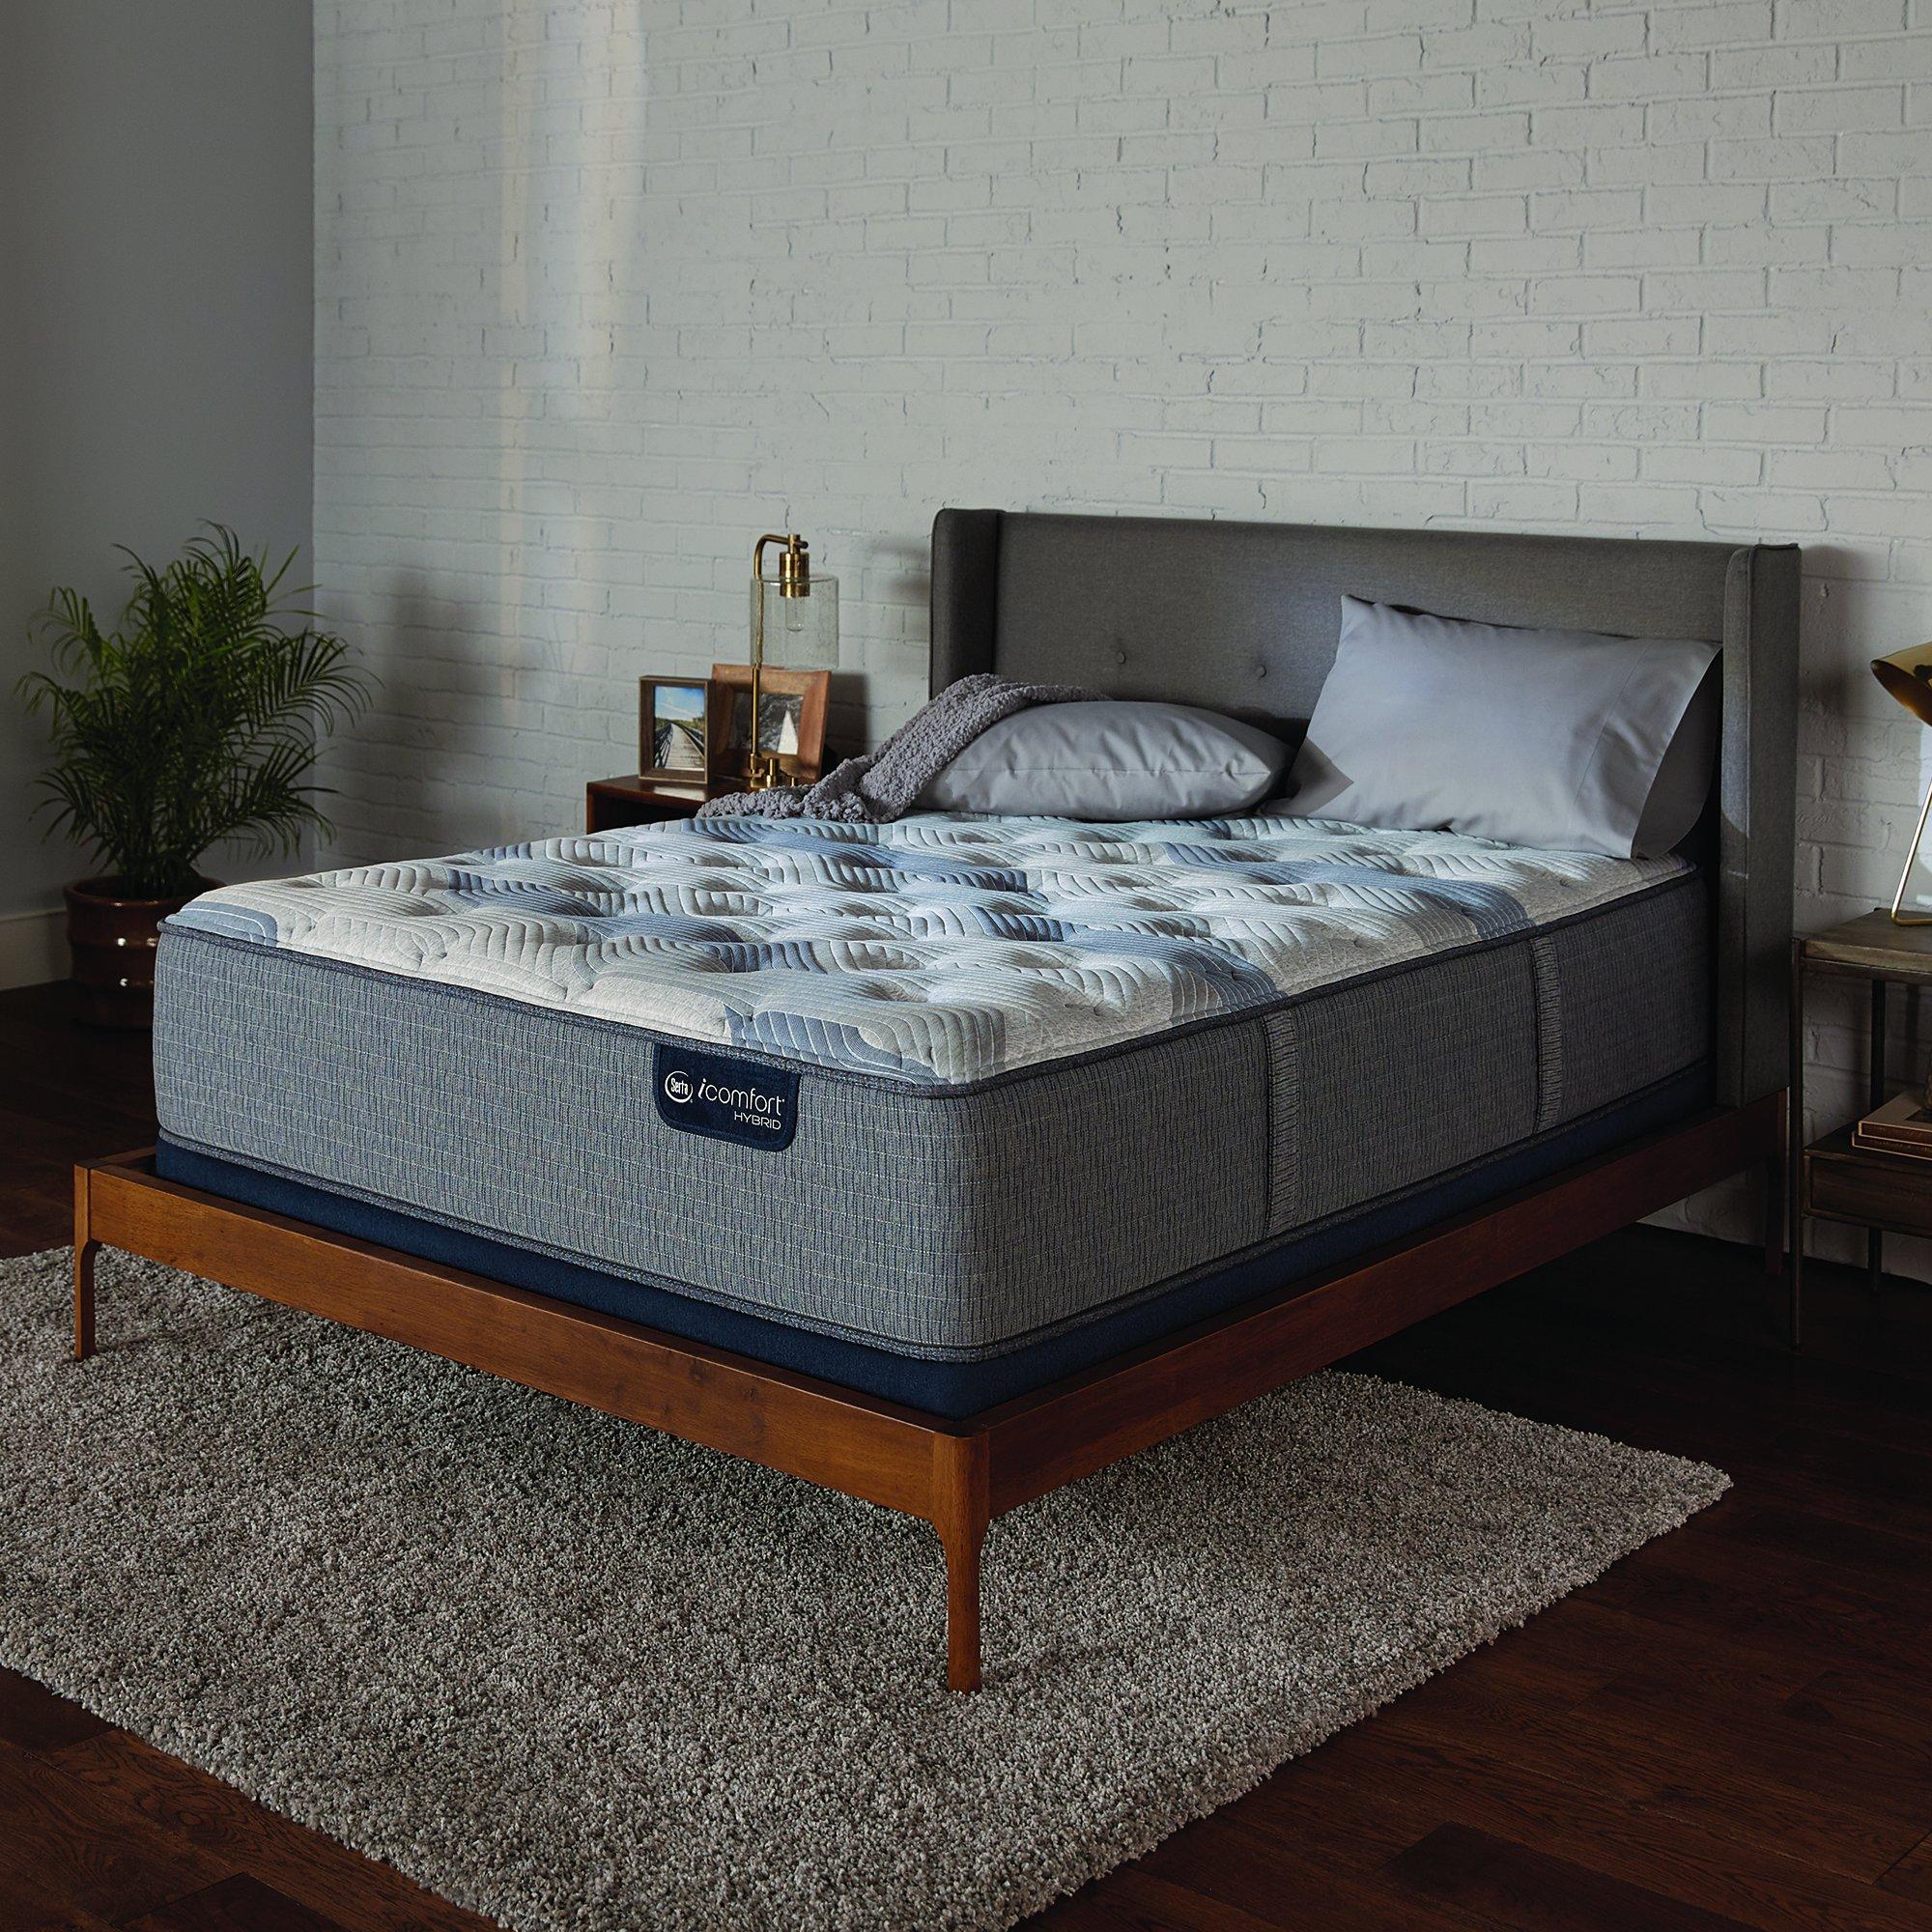 Serta Icomfort Hybrid Conventional Bed Mattress, Full, Gray by Serta